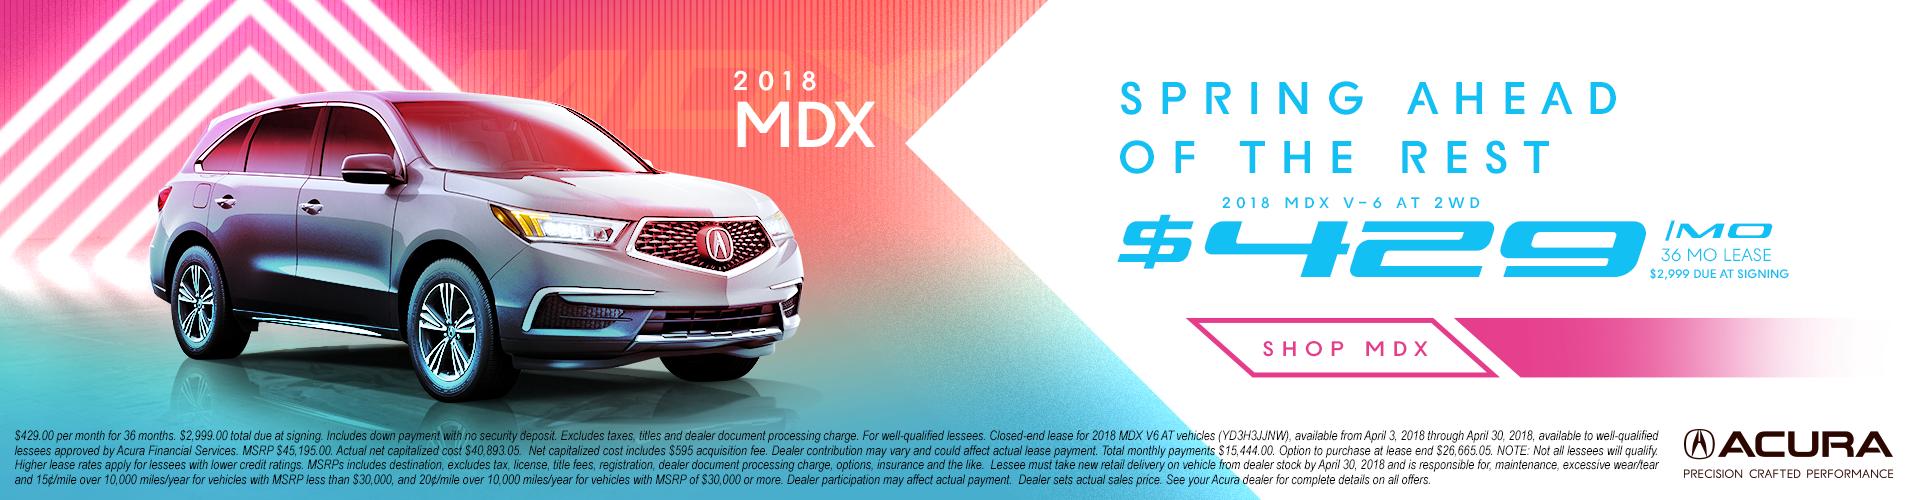 MDX V-6 AT 2WD